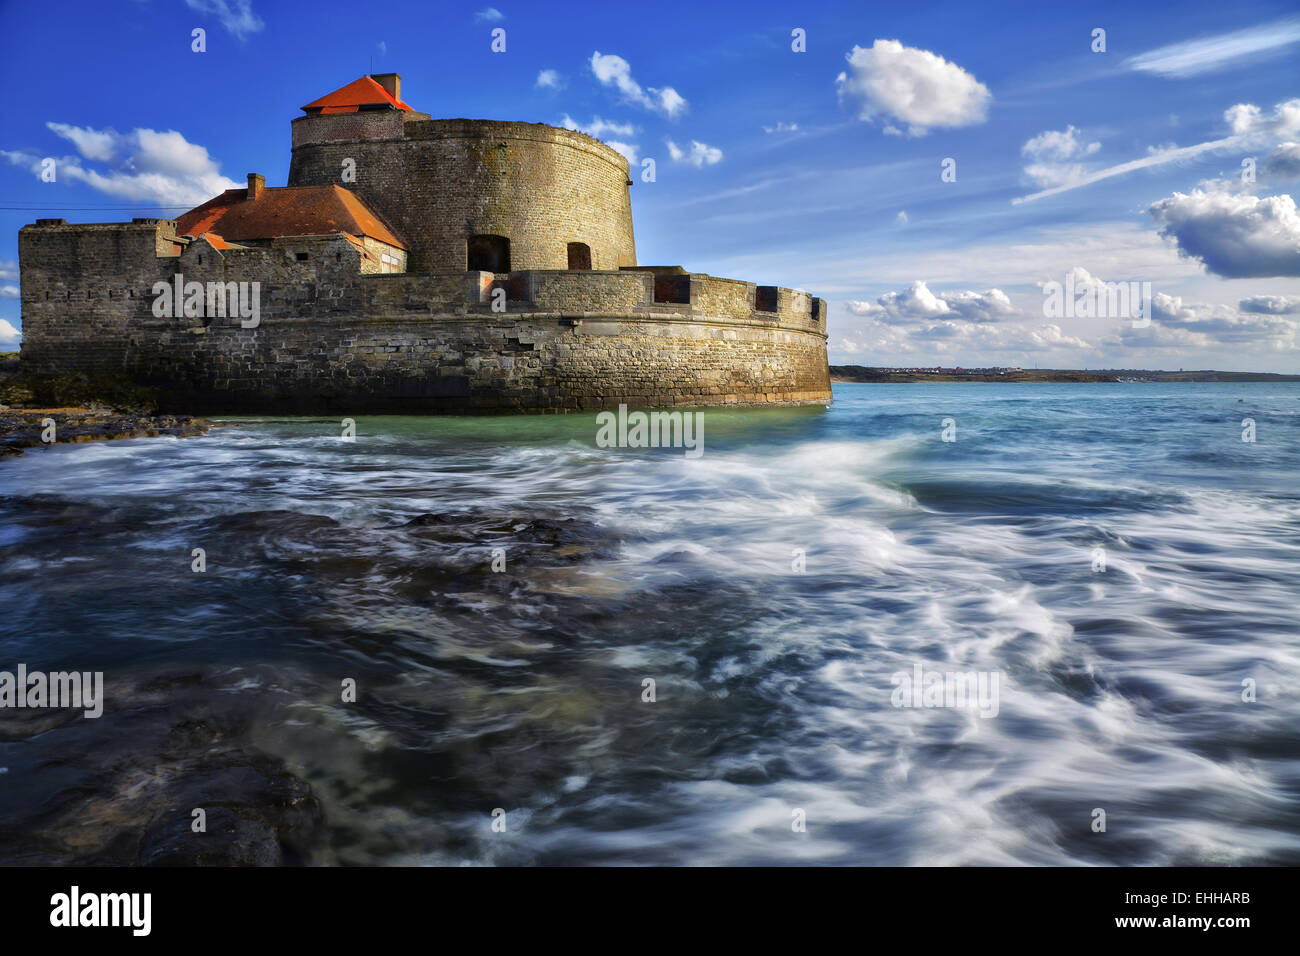 Vauban Fort Mahon, Amleteuse, France Stock Photo